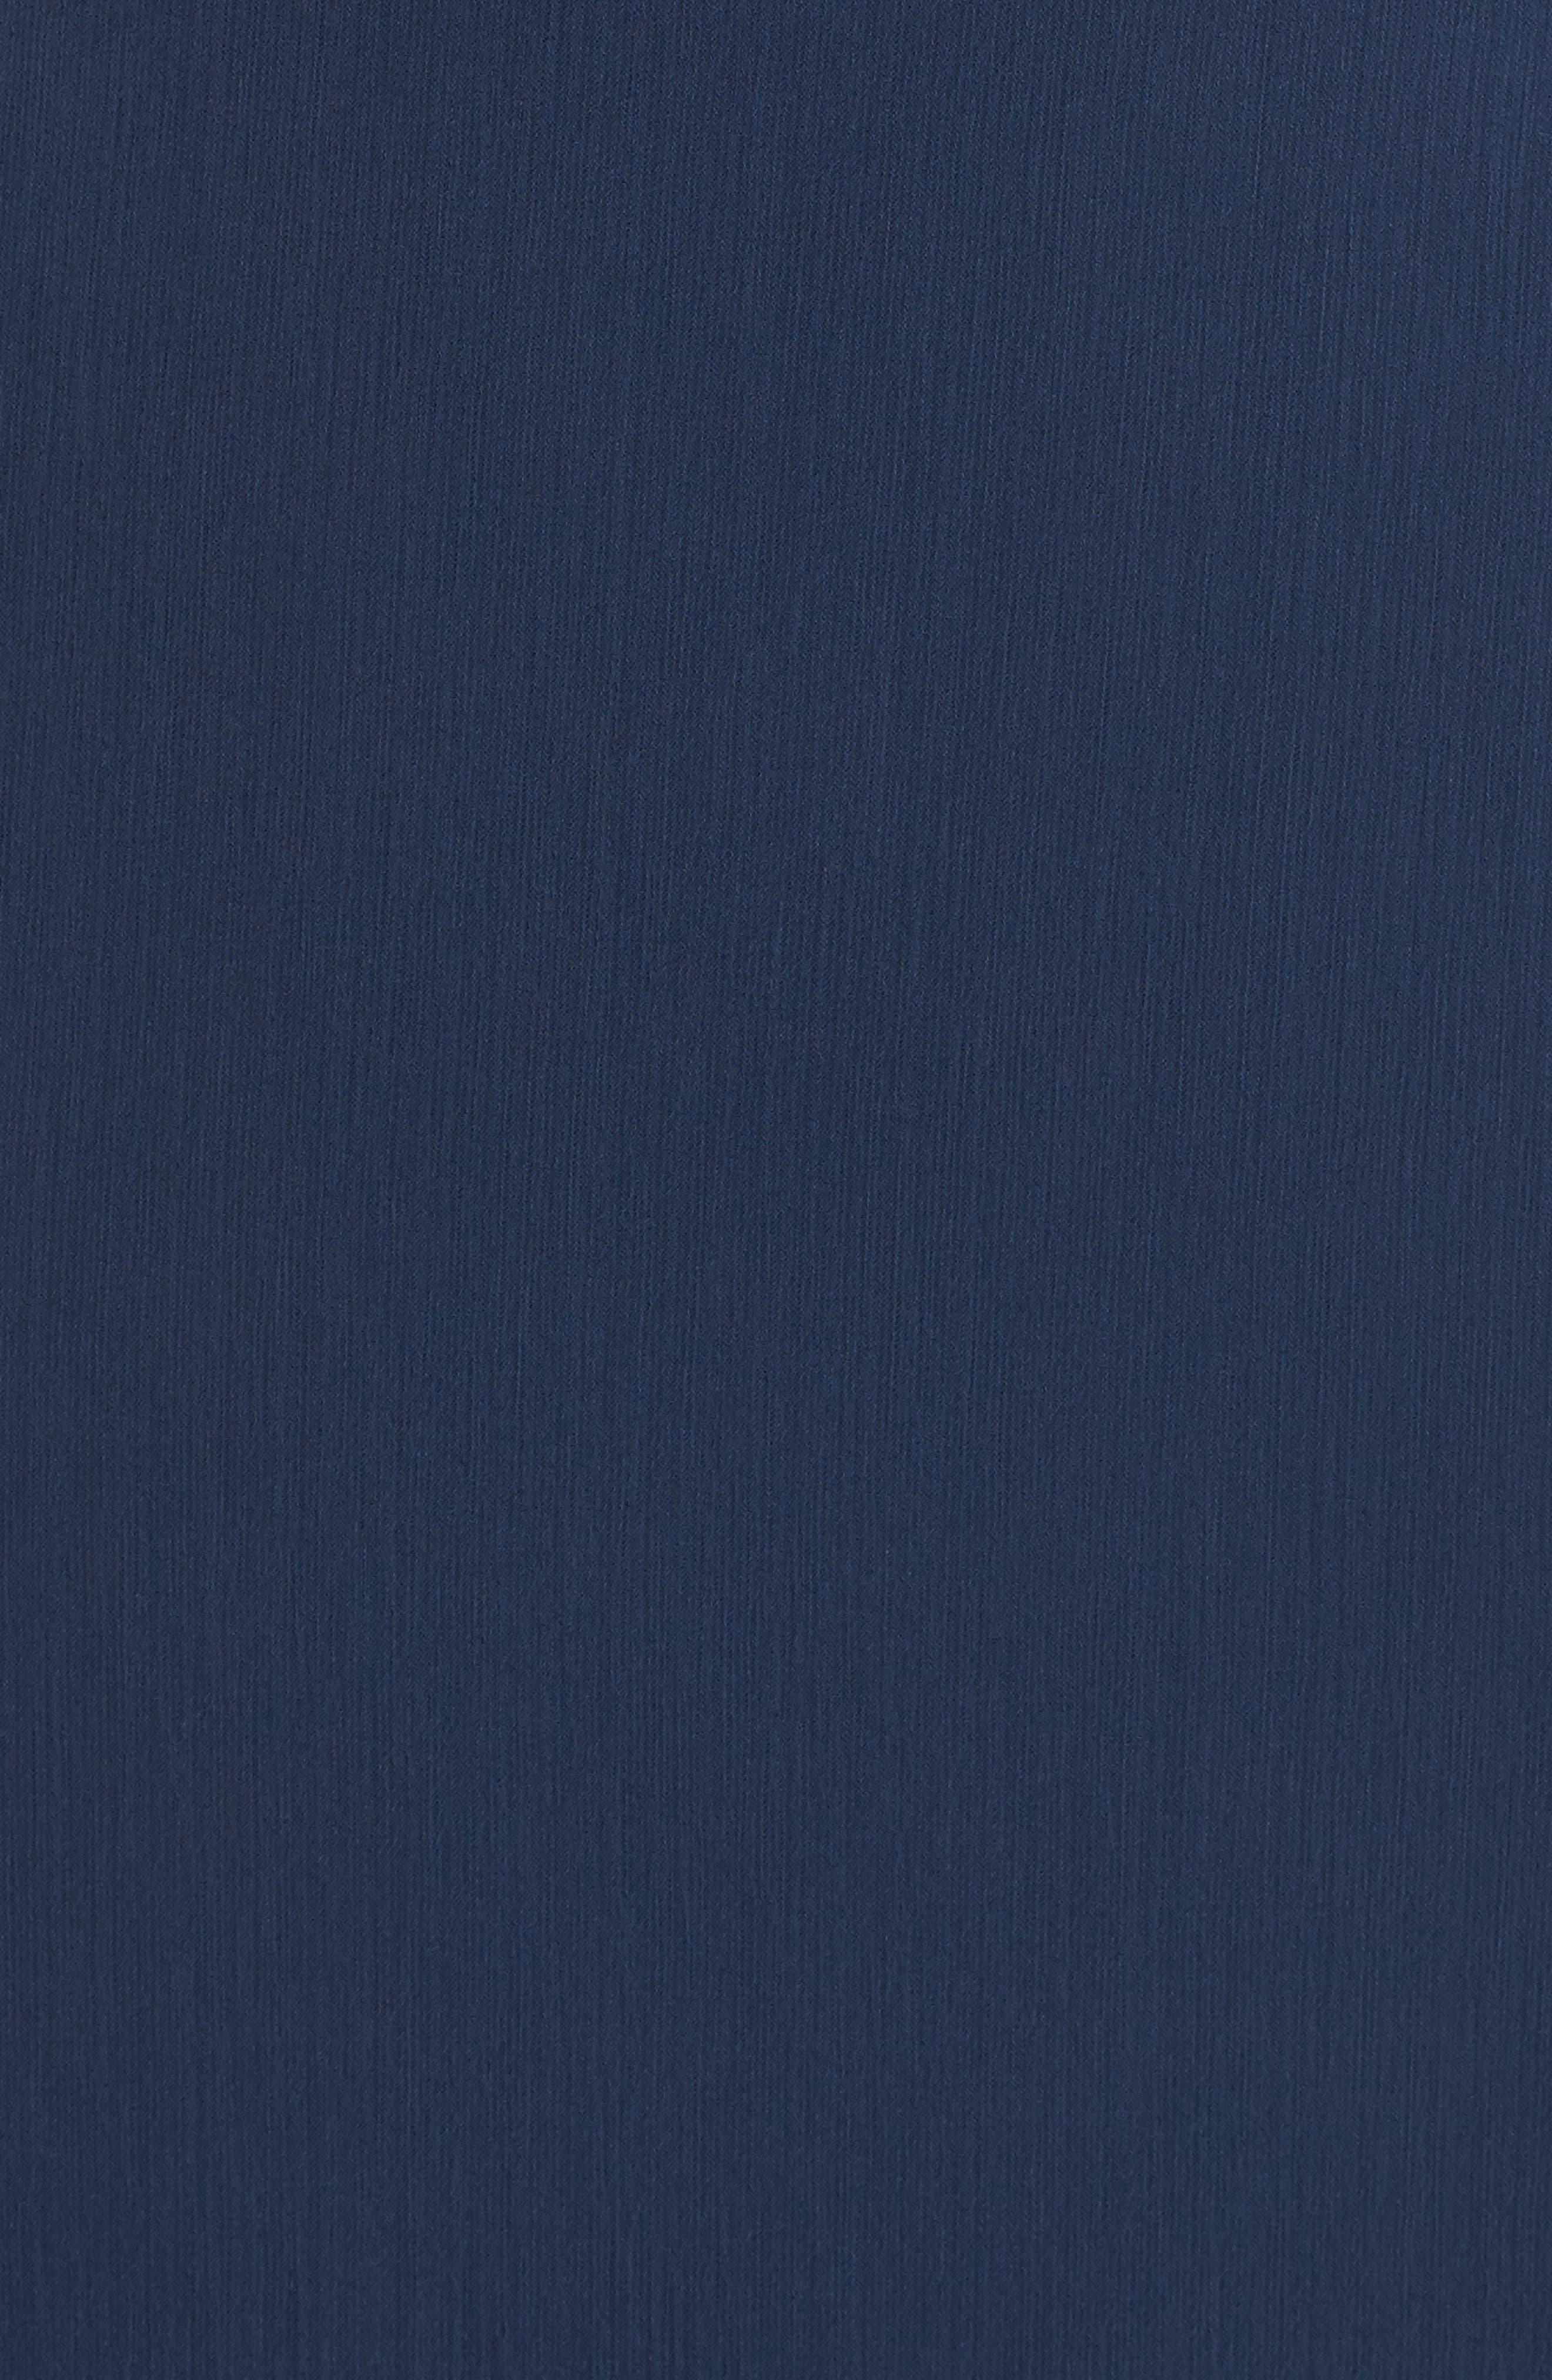 Lauren Cold Shoulder Tiered Gown,                             Alternate thumbnail 5, color,                             Navy